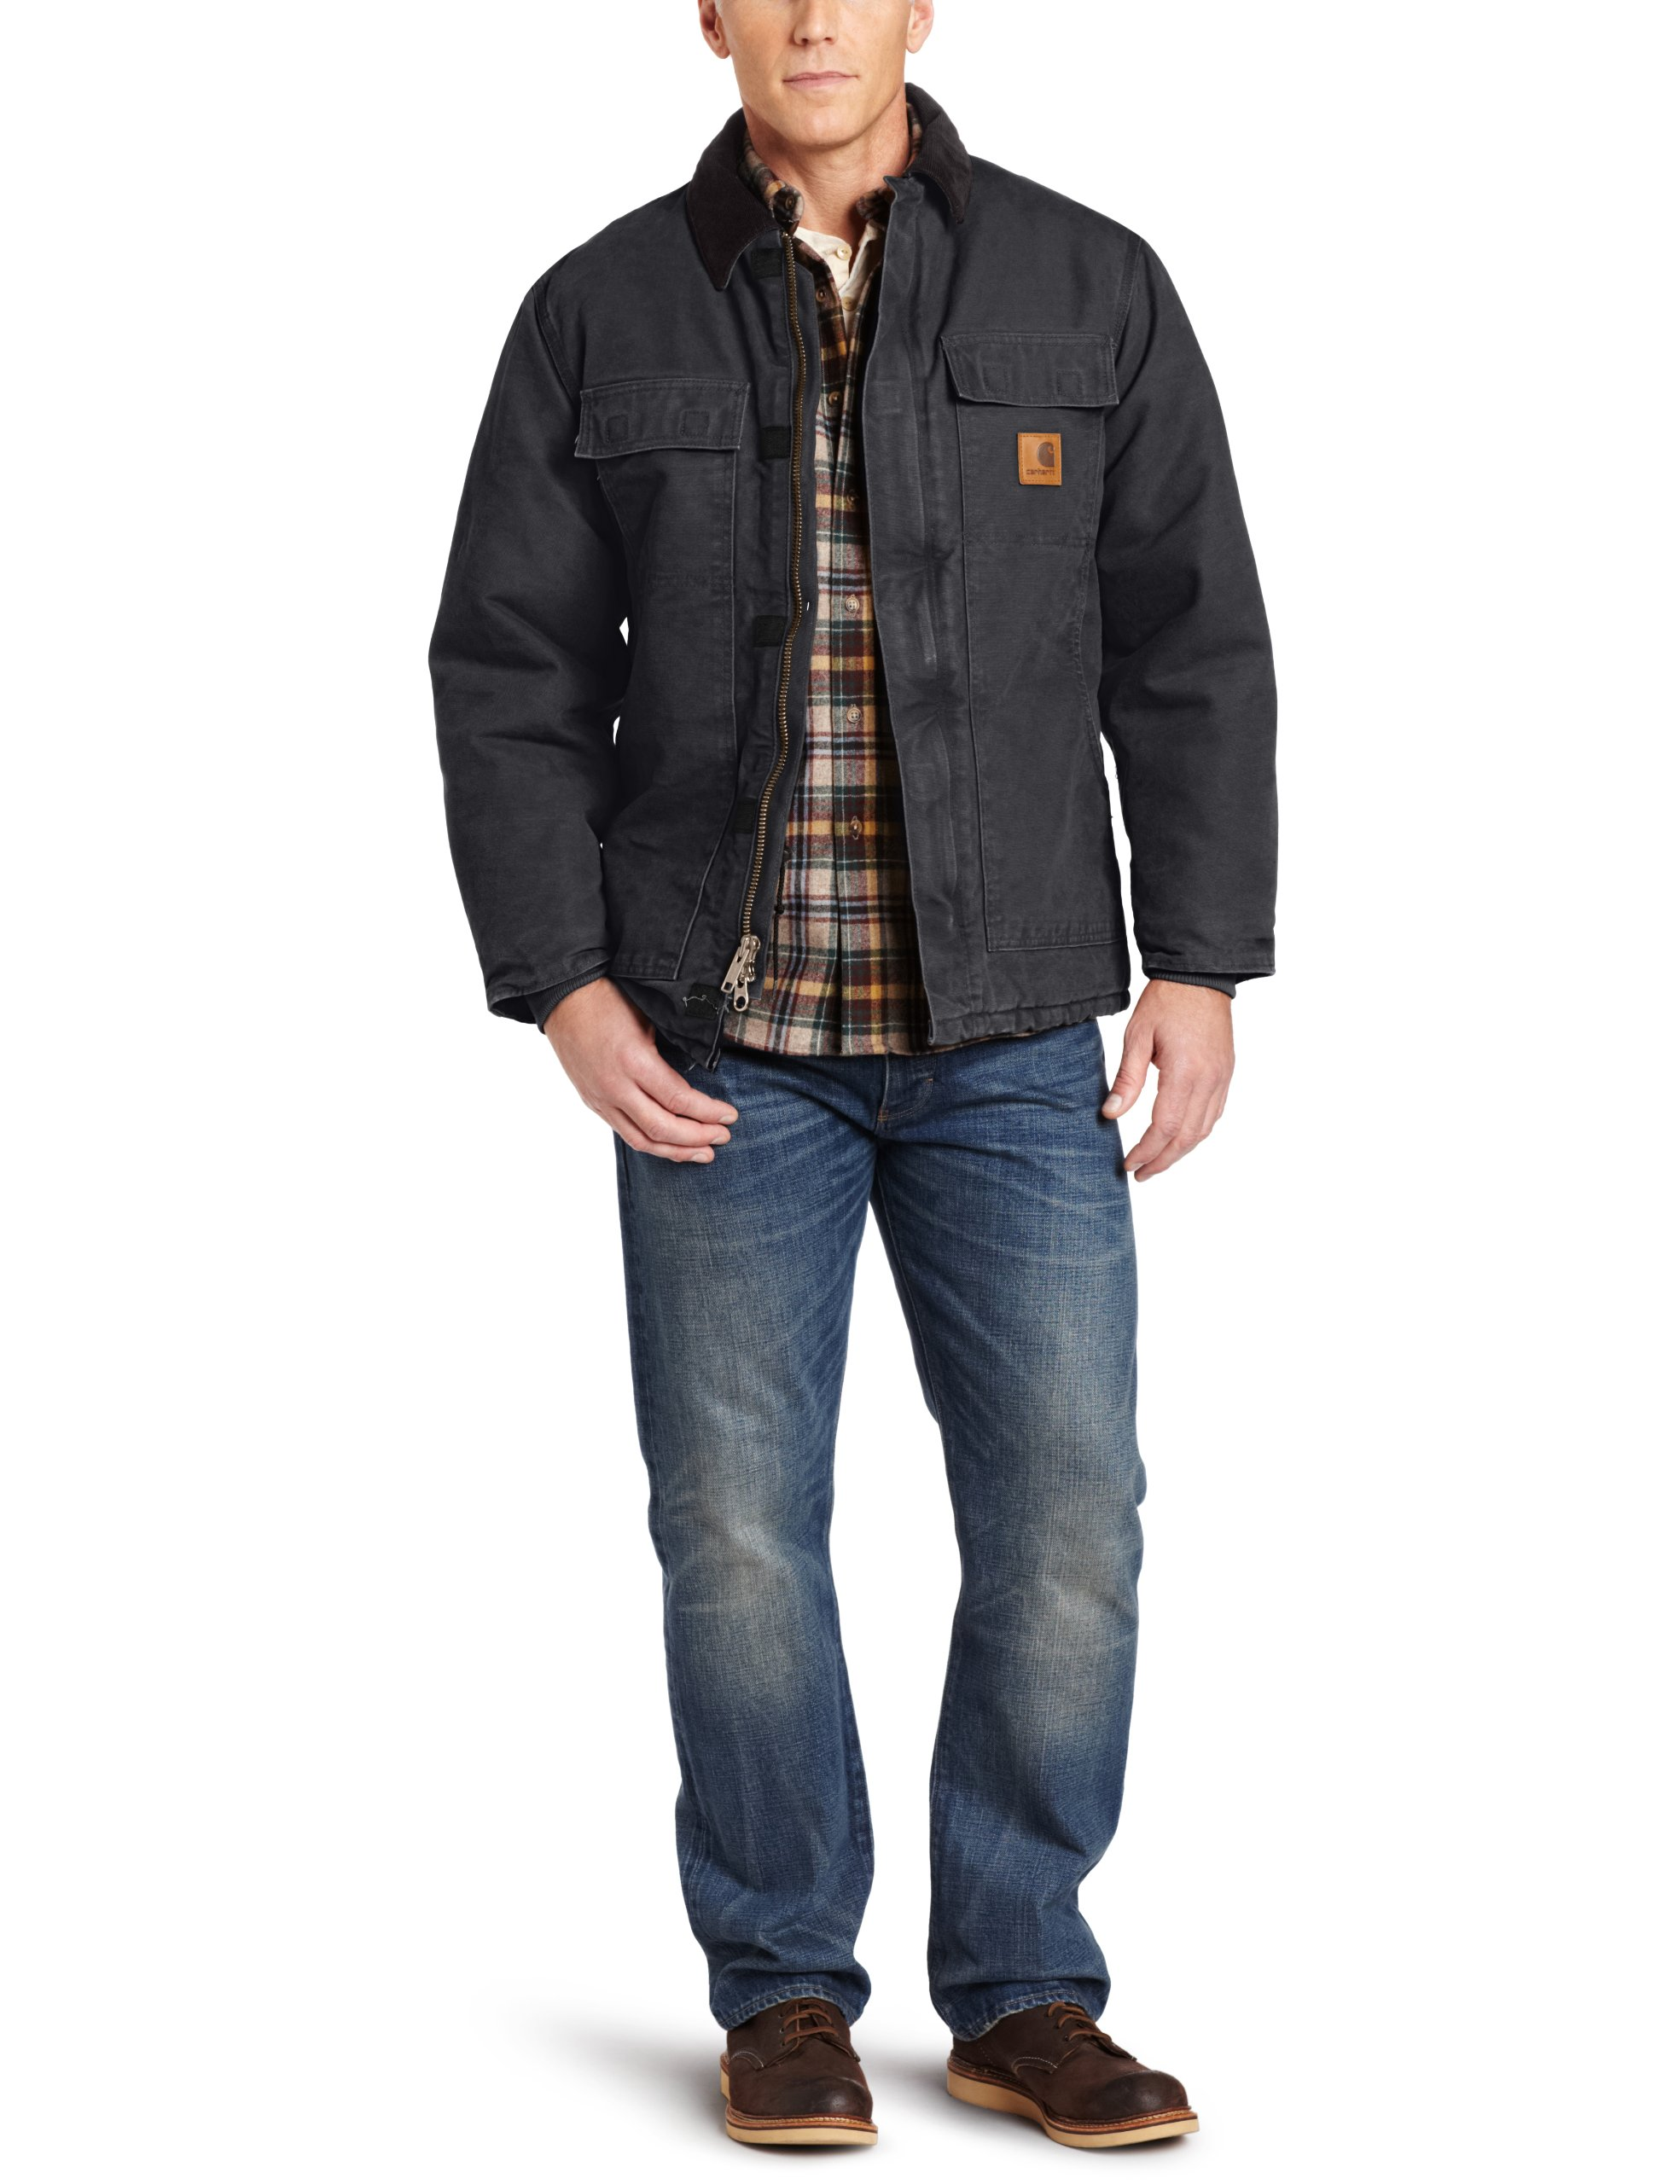 Carhartt Men's Arctic Quilt Lined Sandstone Traditional Coat C26,Black,Large